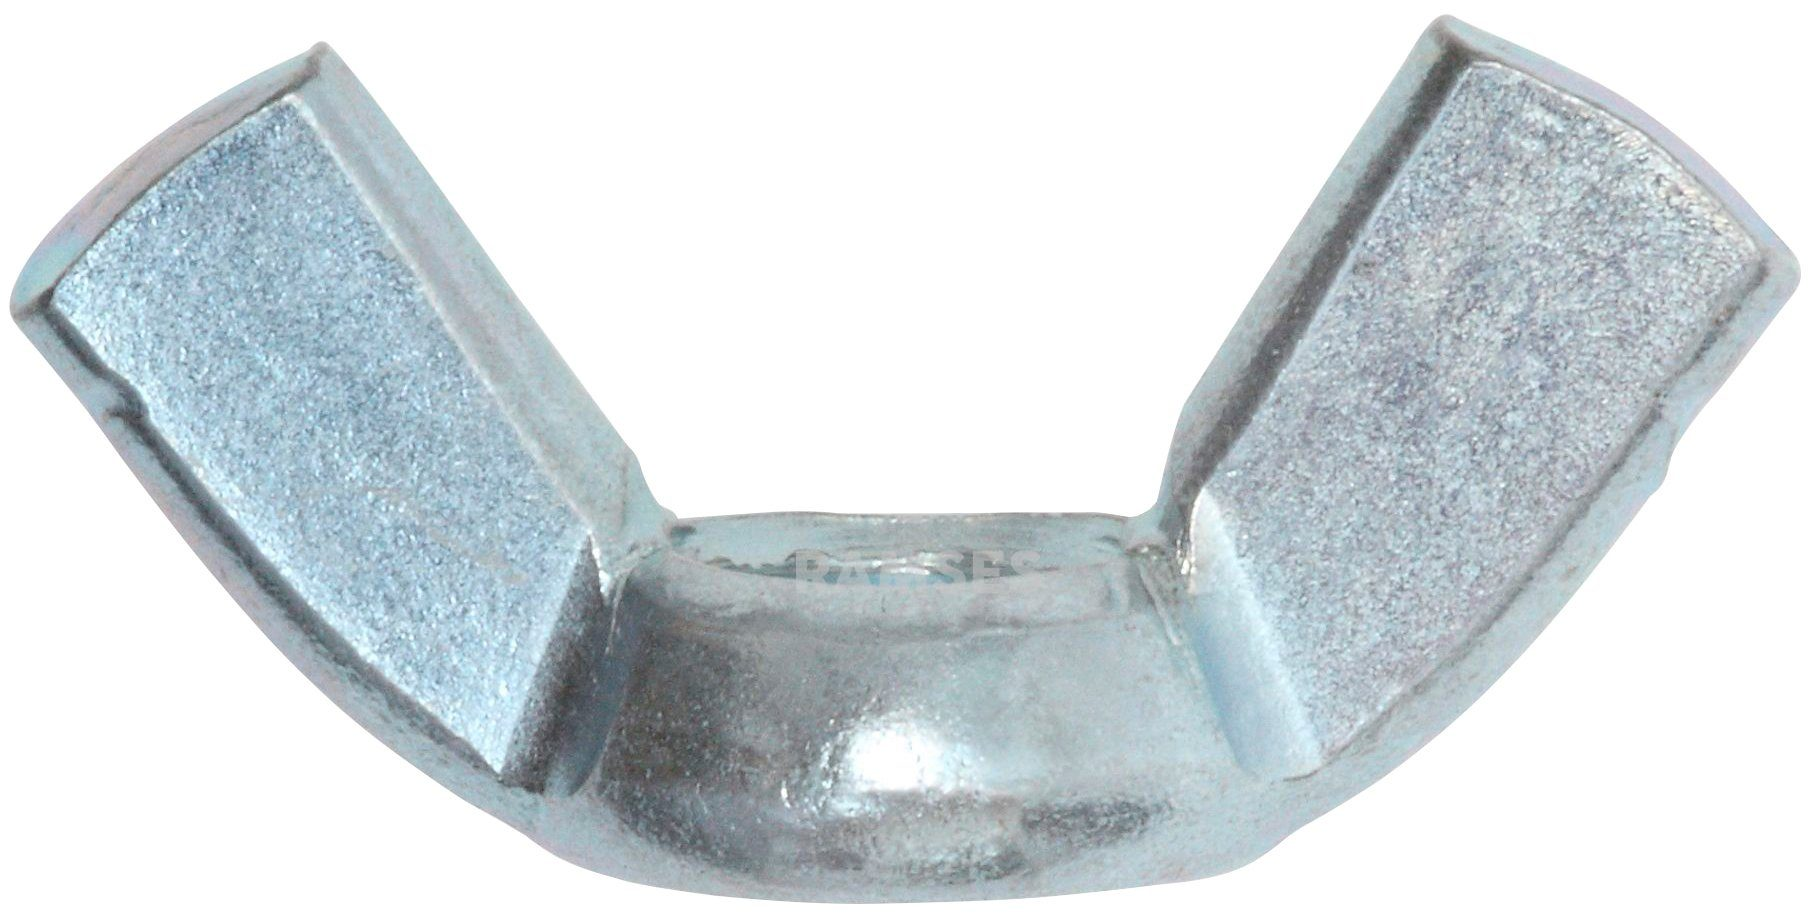 RAMSES Flügelmutter , DIN 315 Amerikanische Form M12, 25 Stück